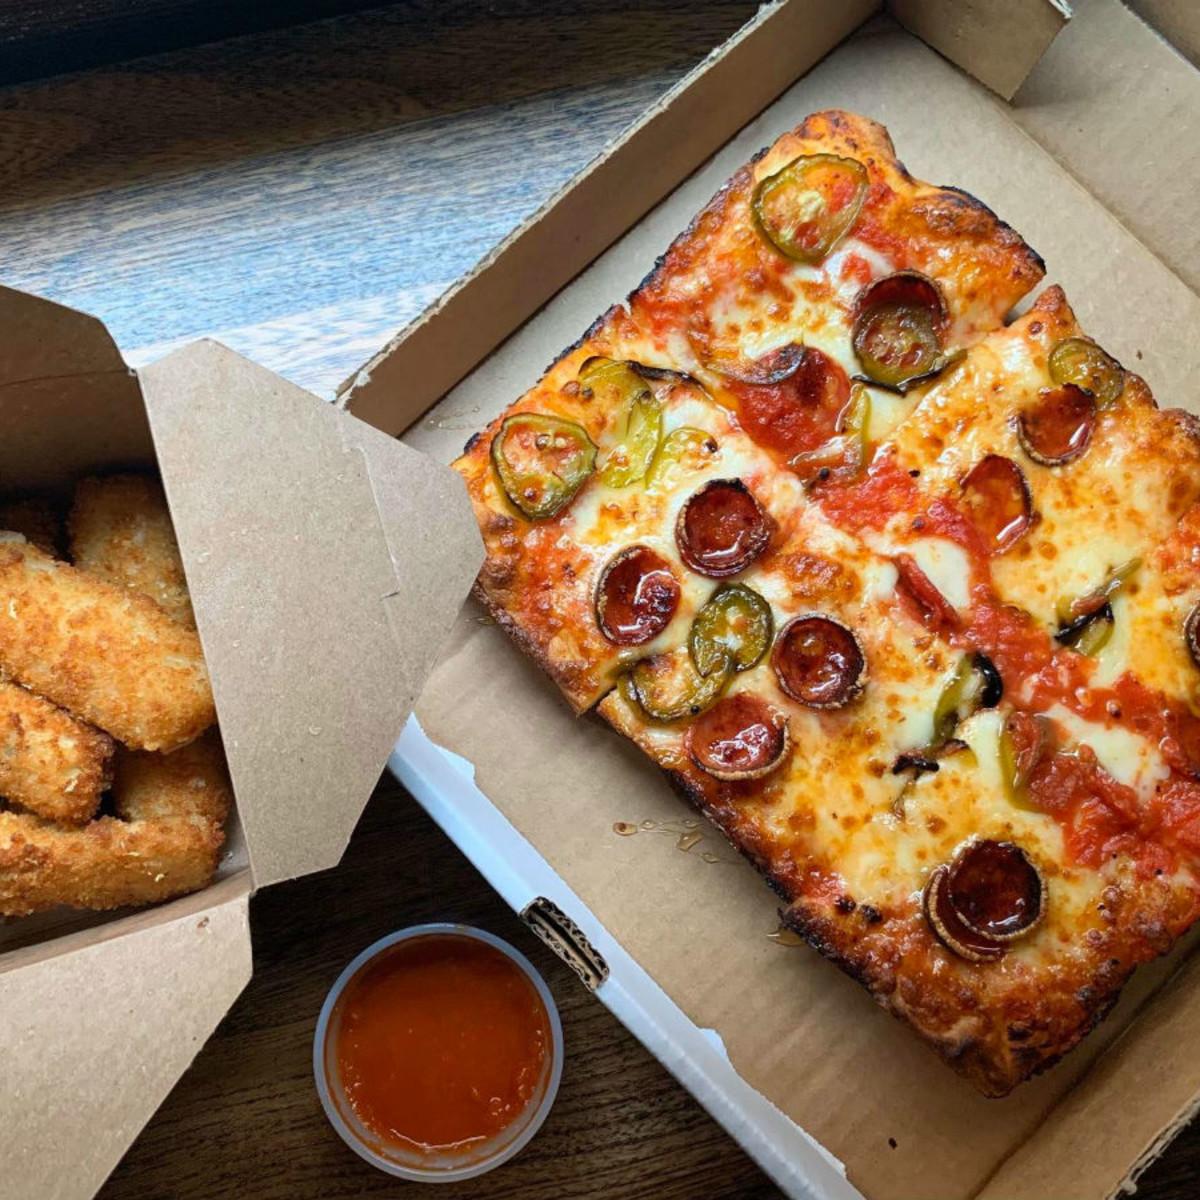 Gemelle pizza